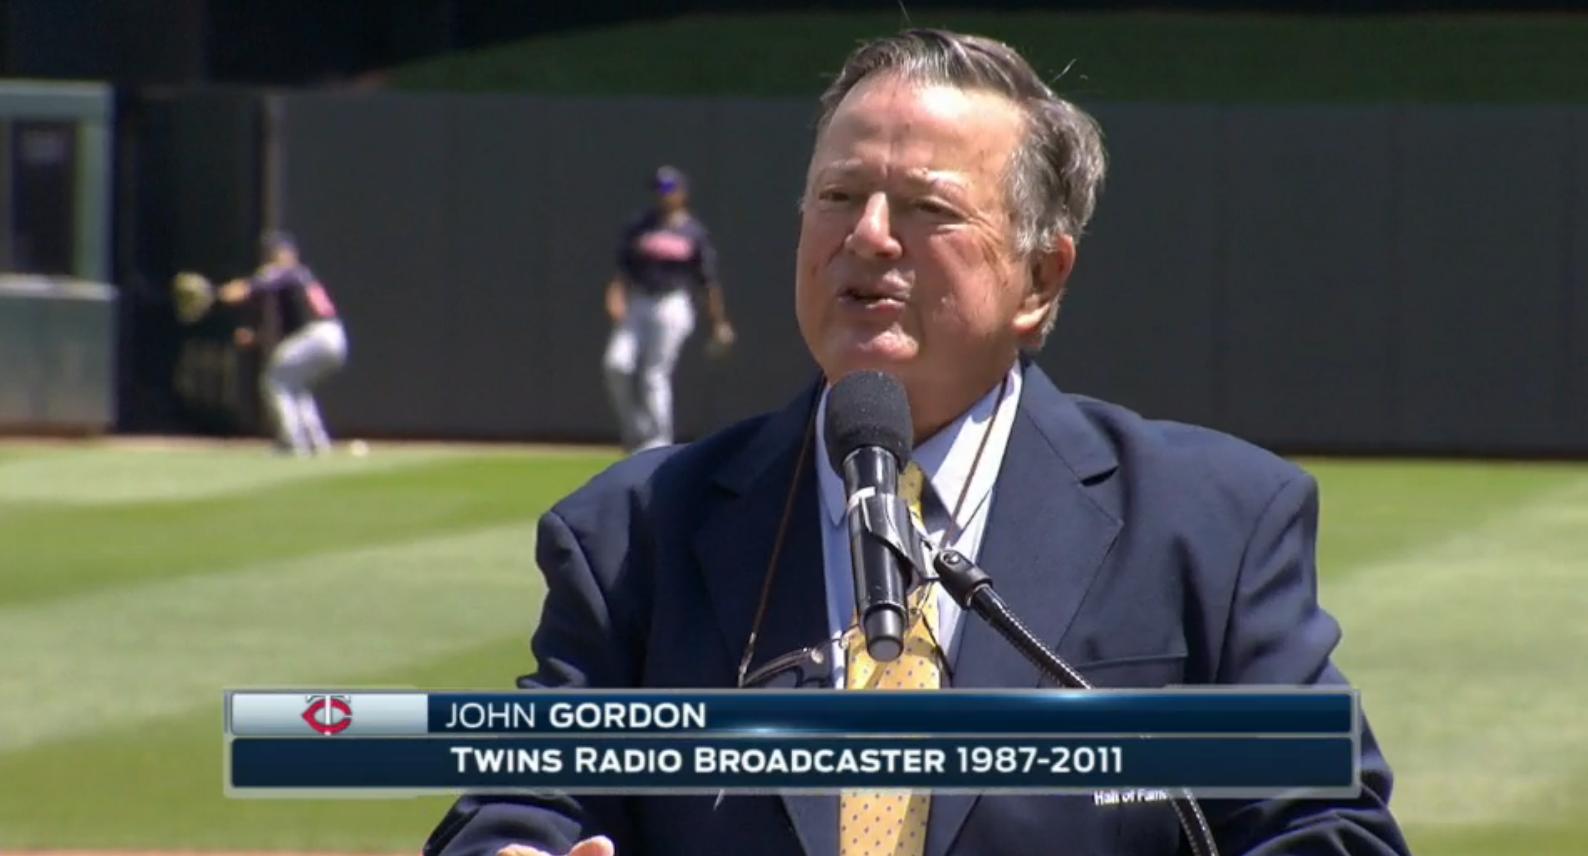 photo of Twins radio broadcaster John Gordon